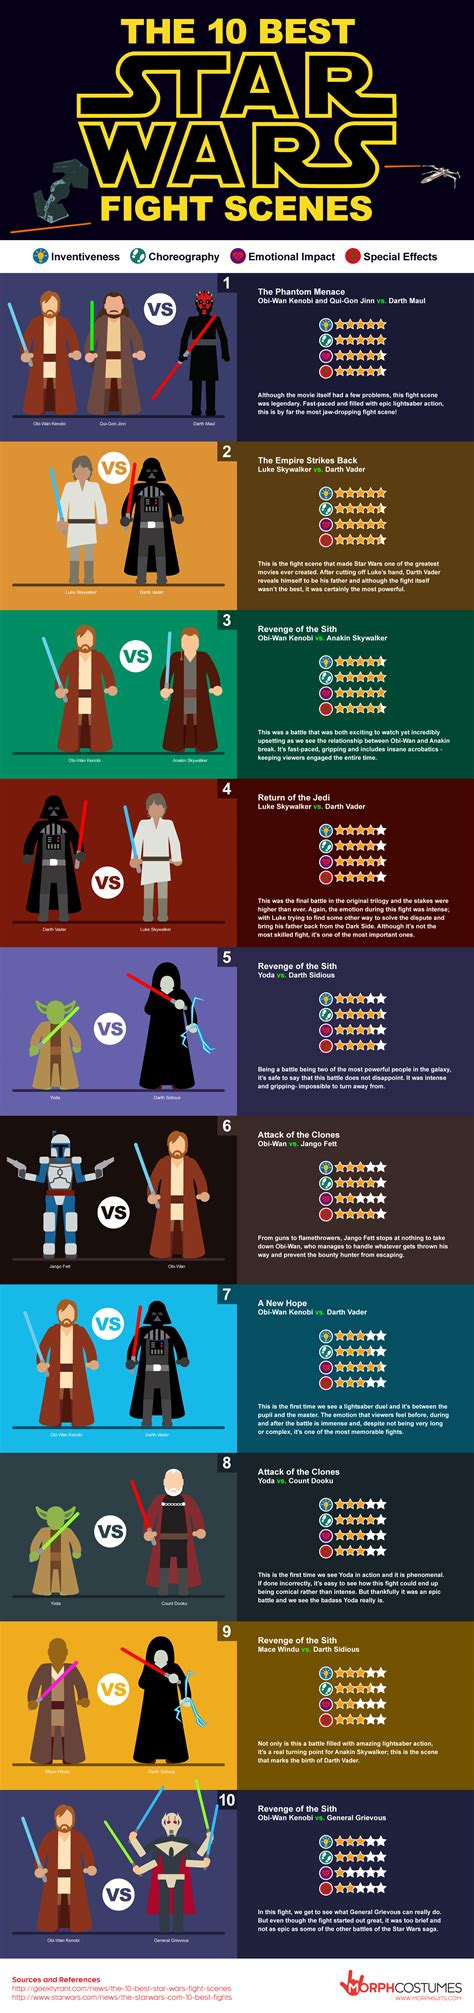 Infographic Top 10 Star Wars Fight Scenes Viva